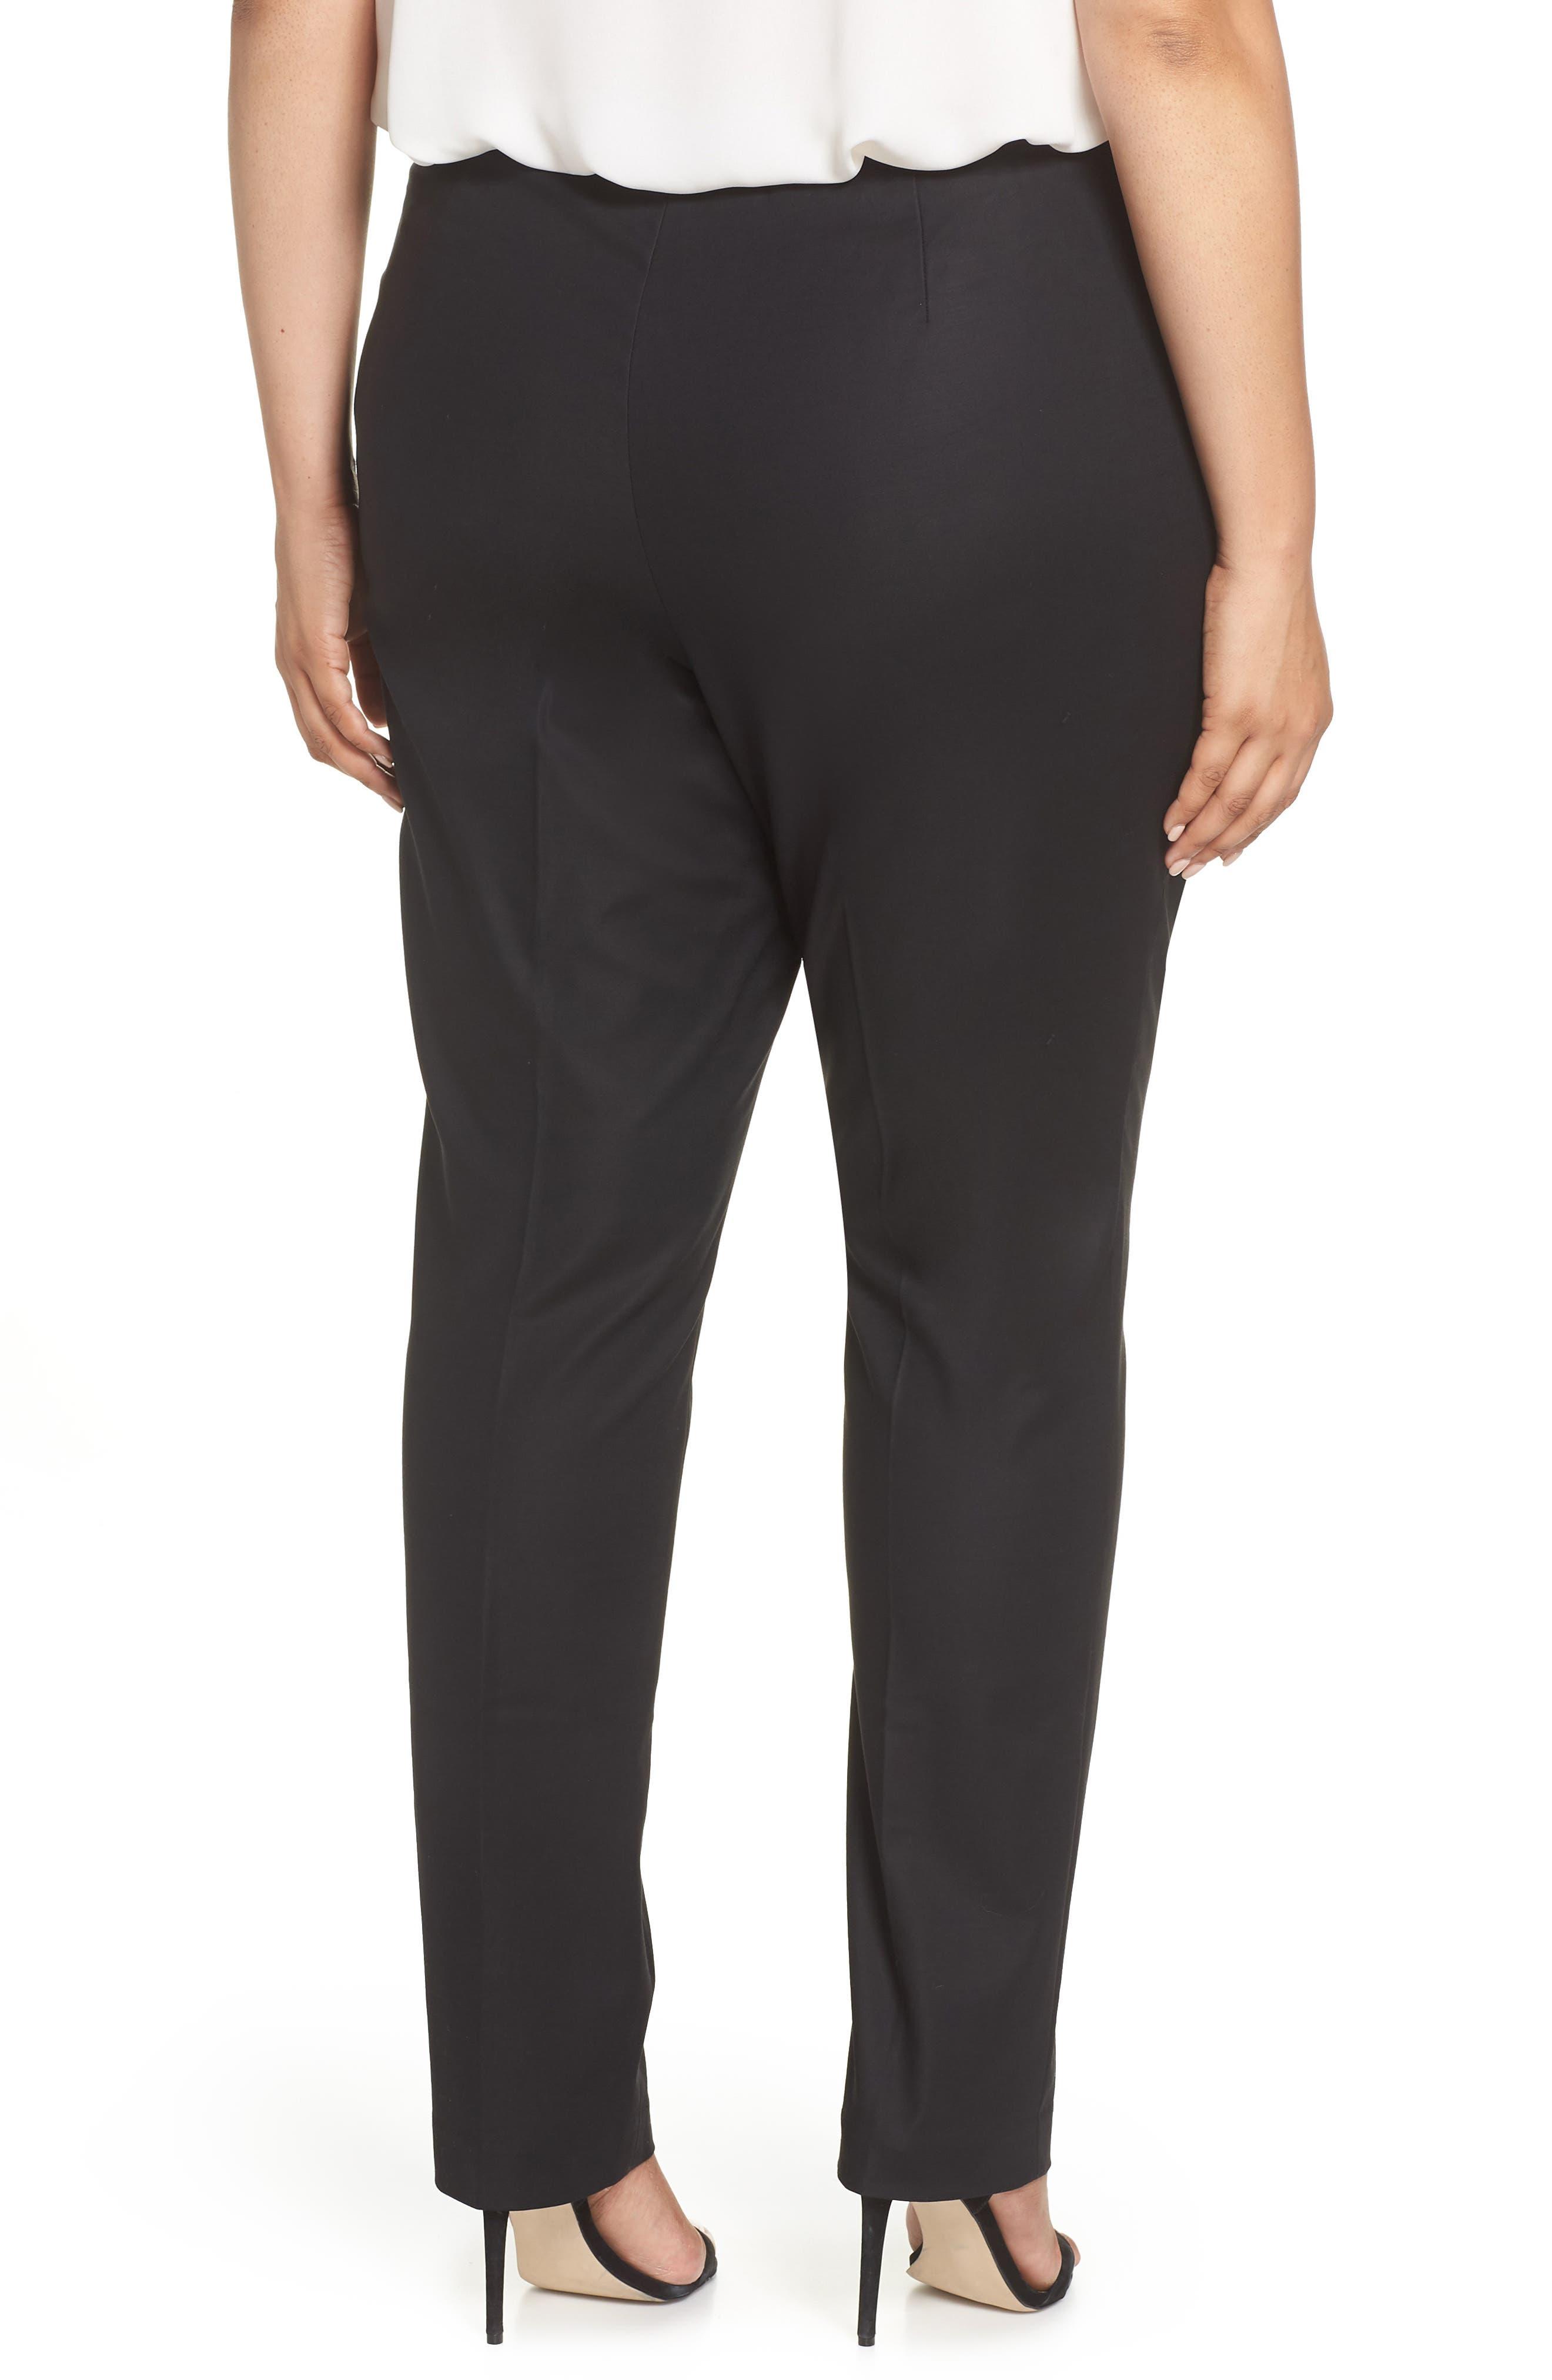 NIC+ZOE, 'Perfect' Side Zip Pants, Alternate thumbnail 2, color, BLACK ONYX